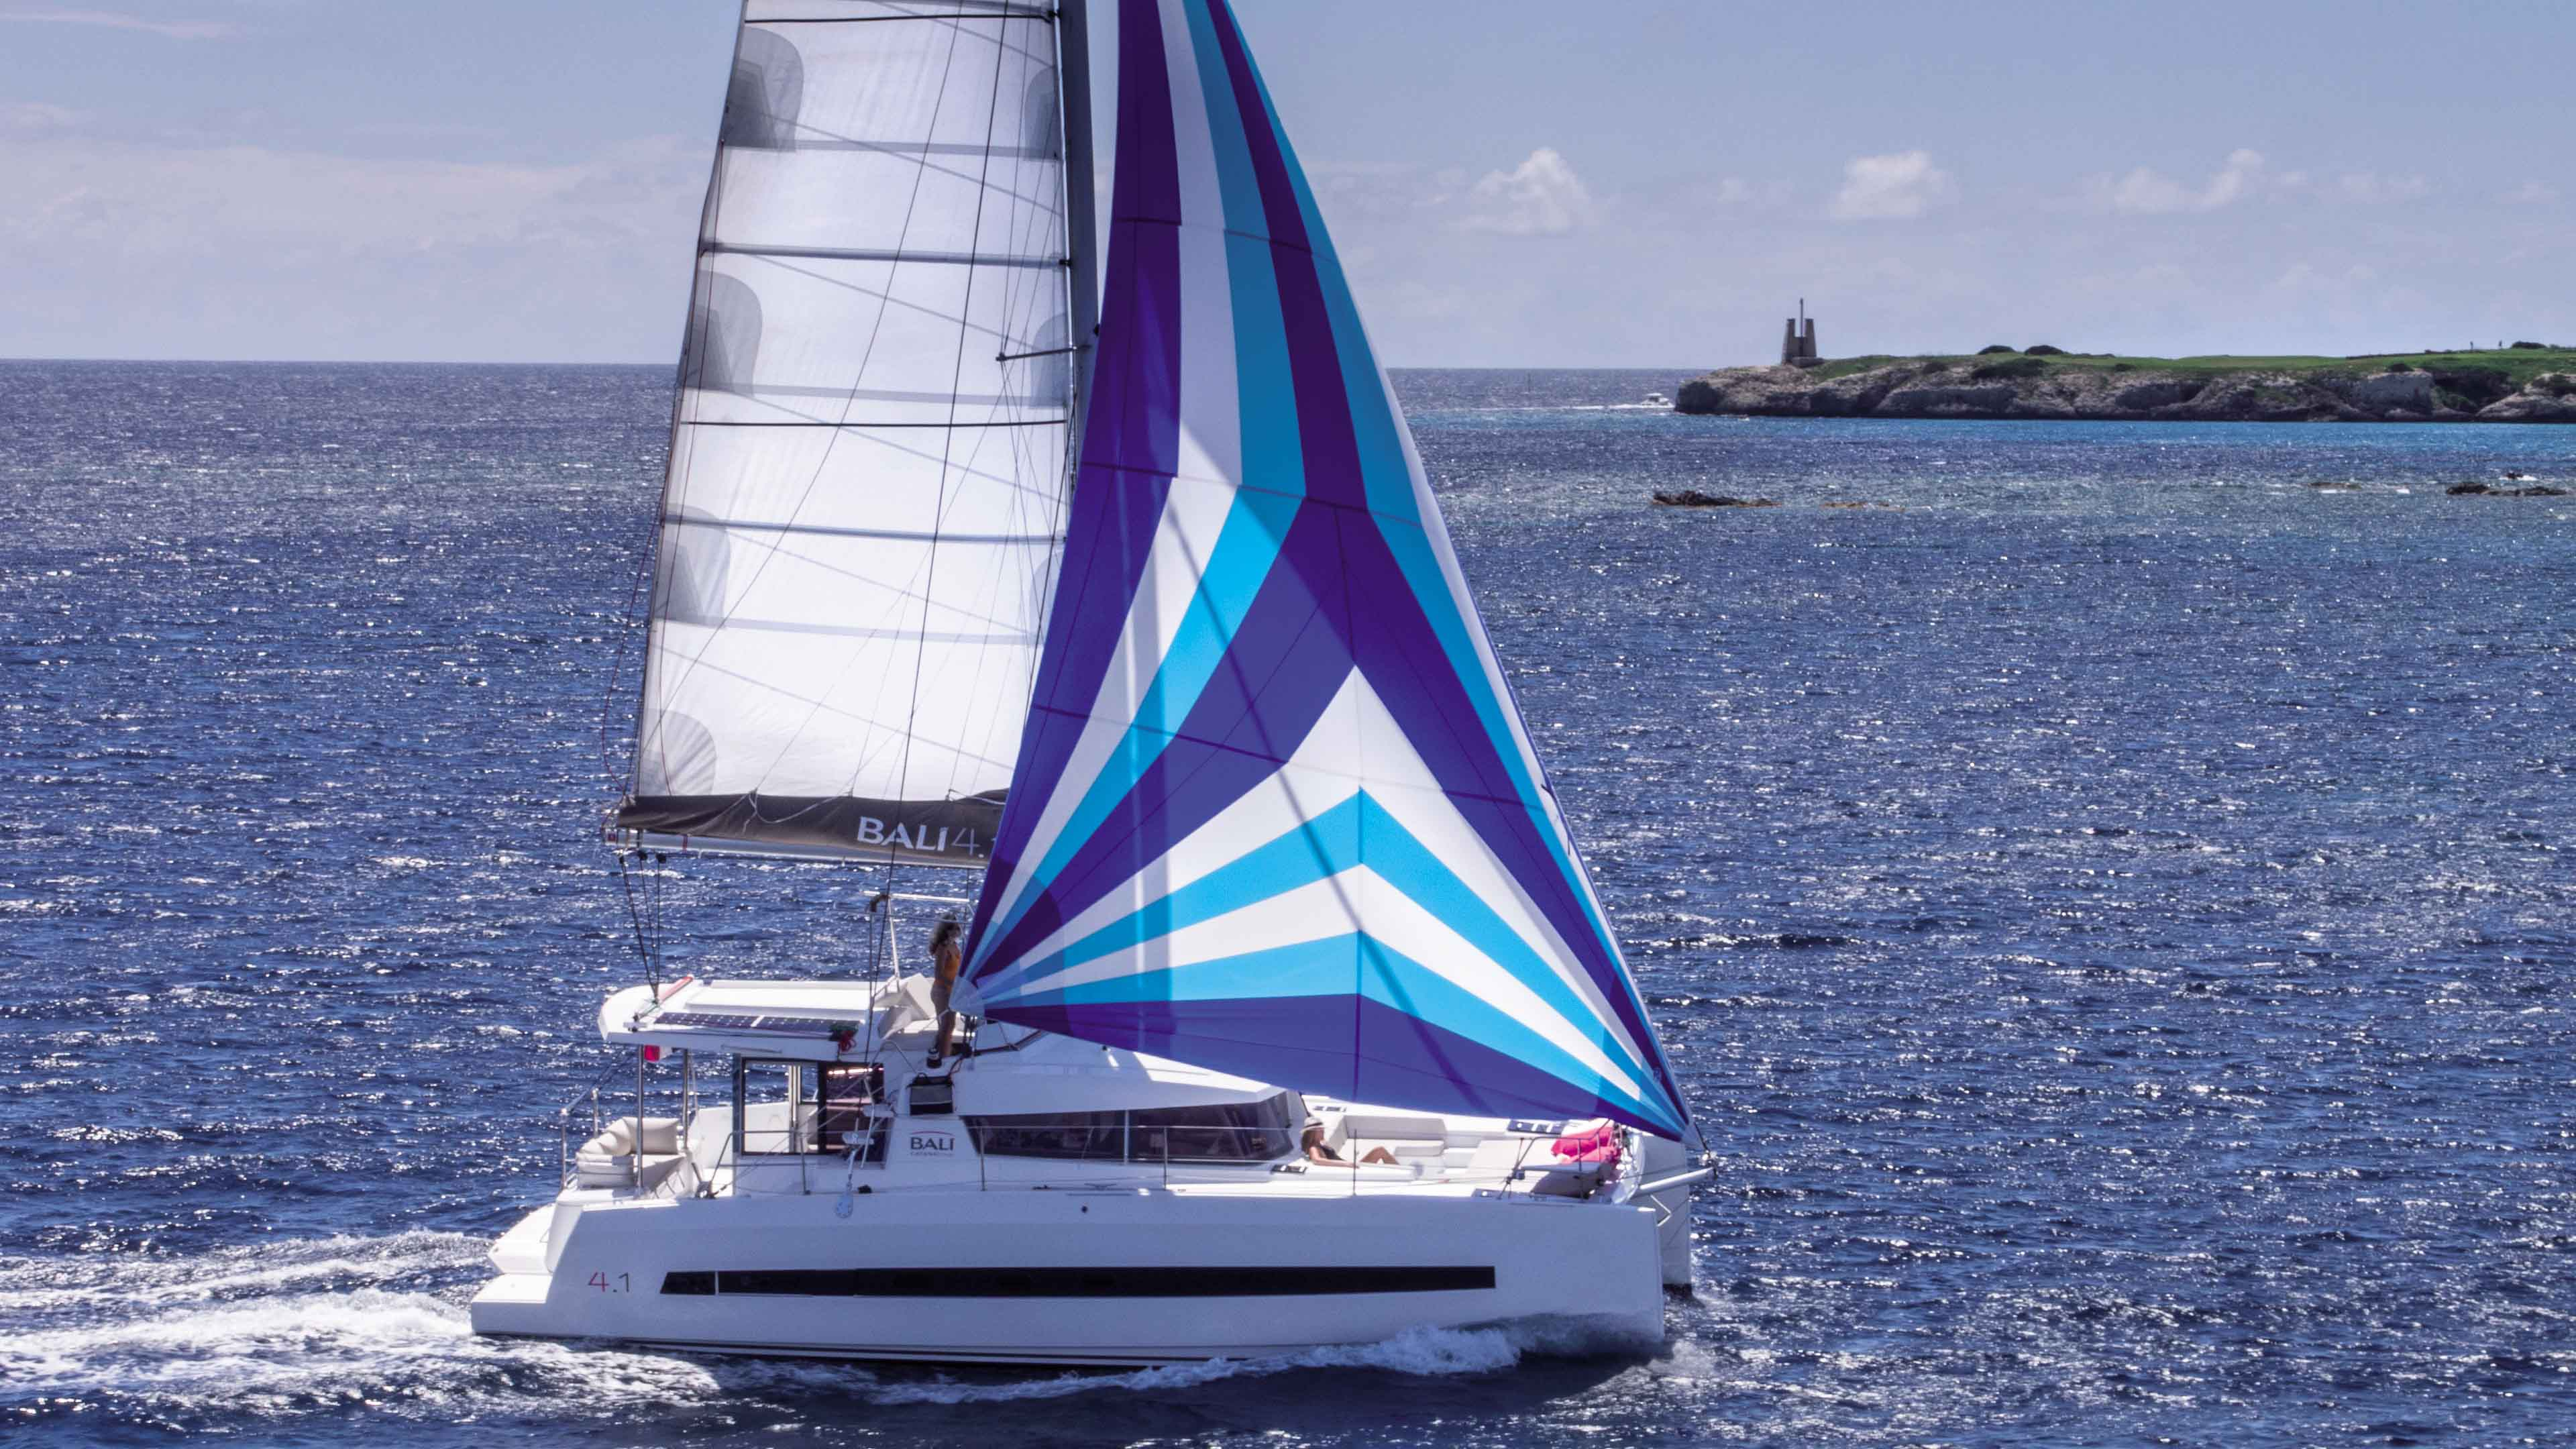 Bali 4.1 Prestige - Catamaran for Charter in Greece